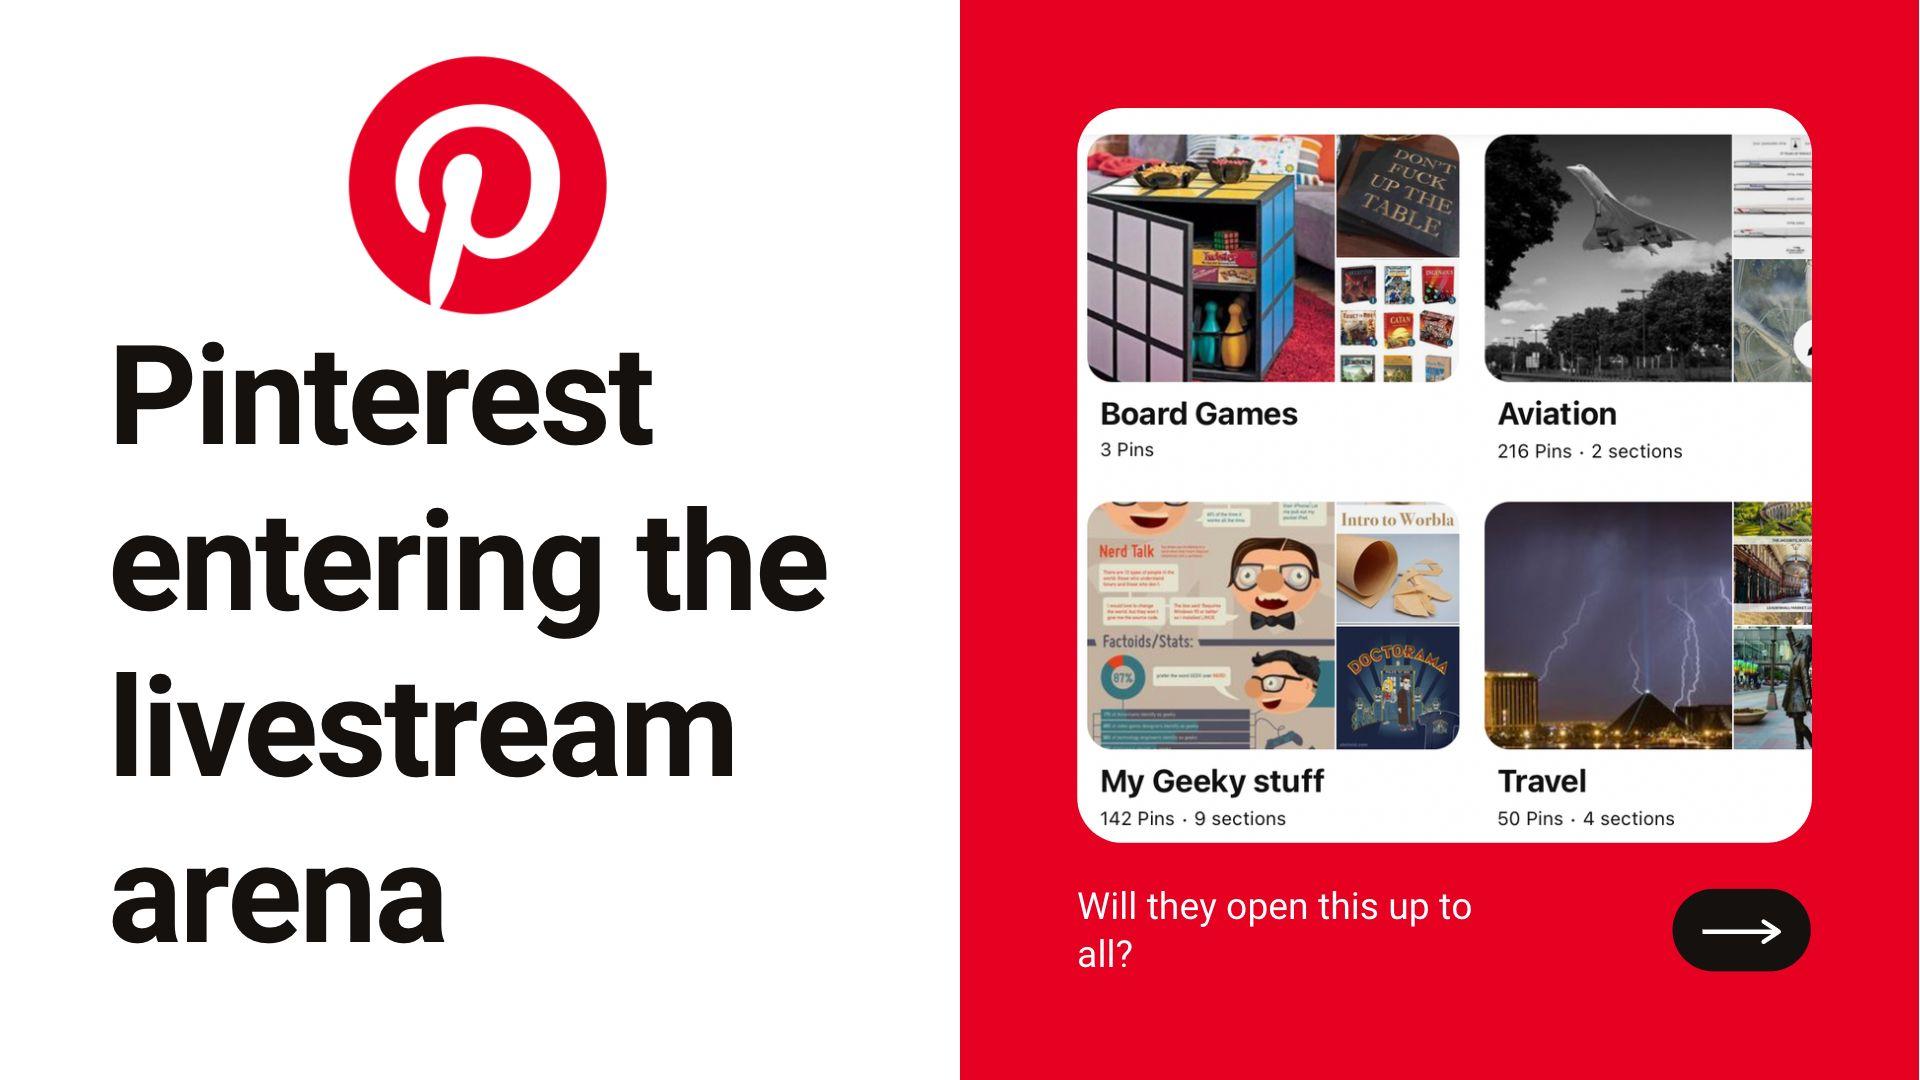 http://marketingelementsblog.com/2021/05/is-pinterest-adding-livestreams/